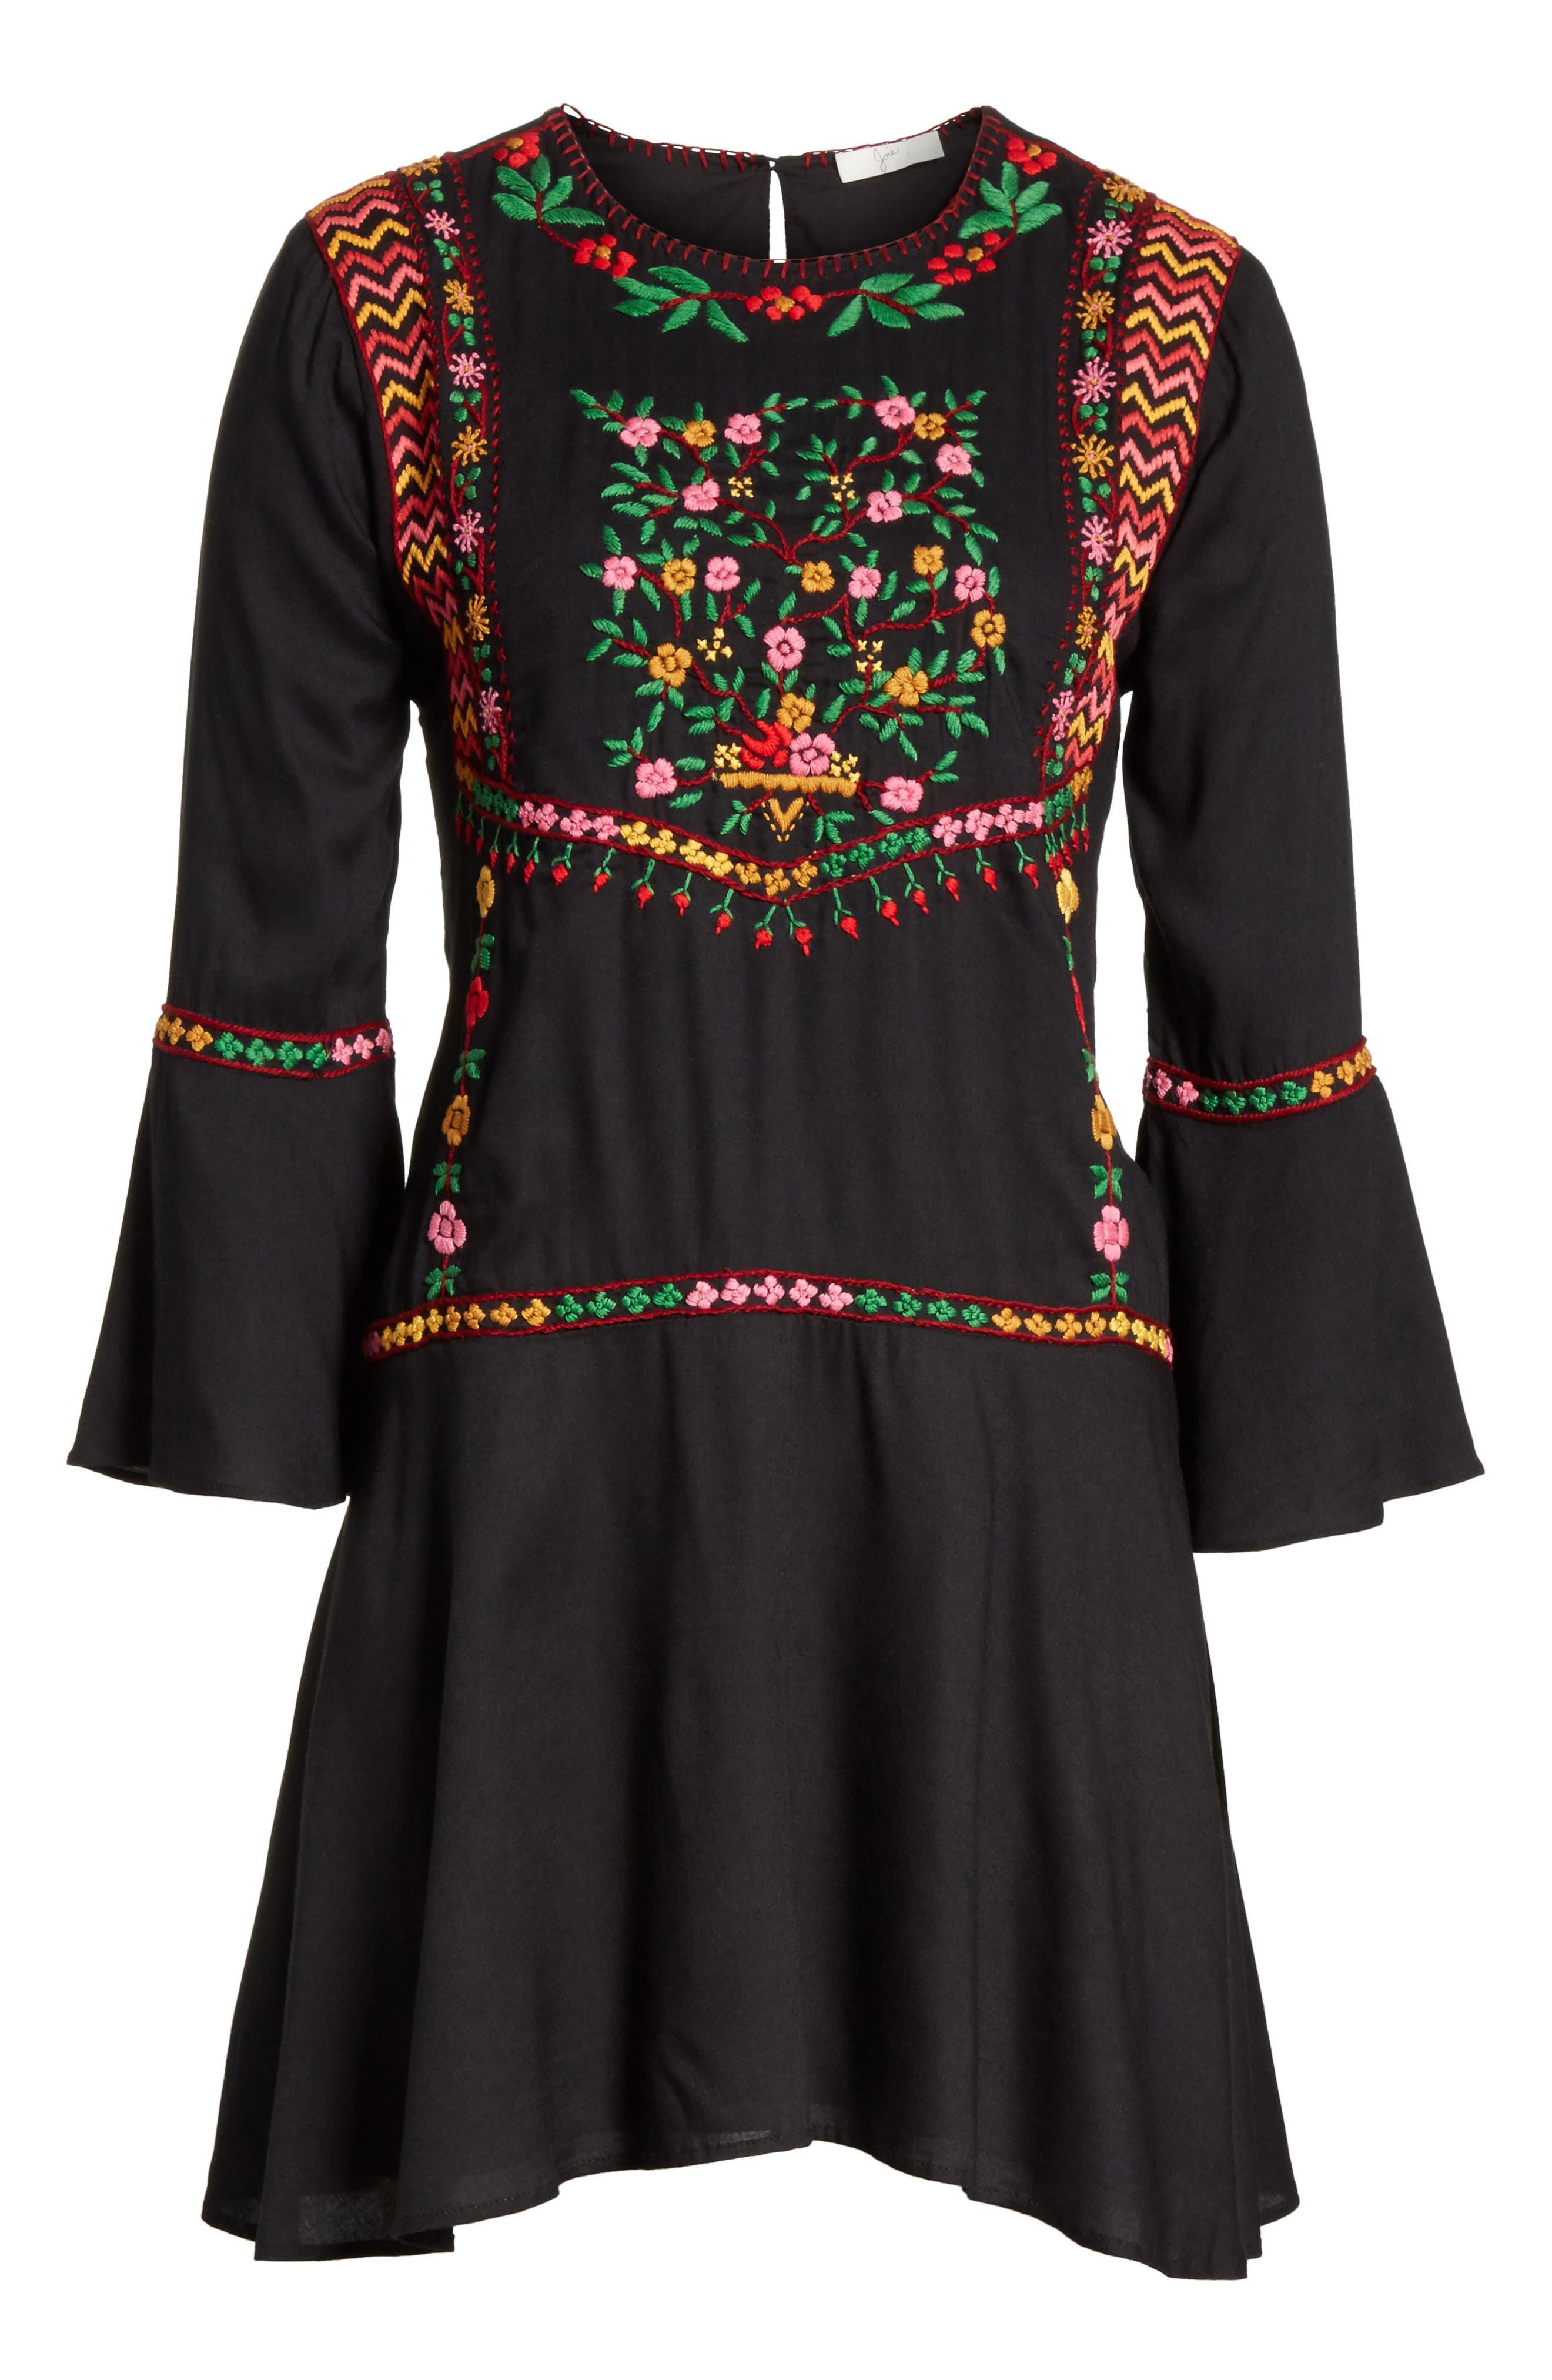 Gosinda Embroidered Dress,                             Alternate thumbnail 6, color,                             009